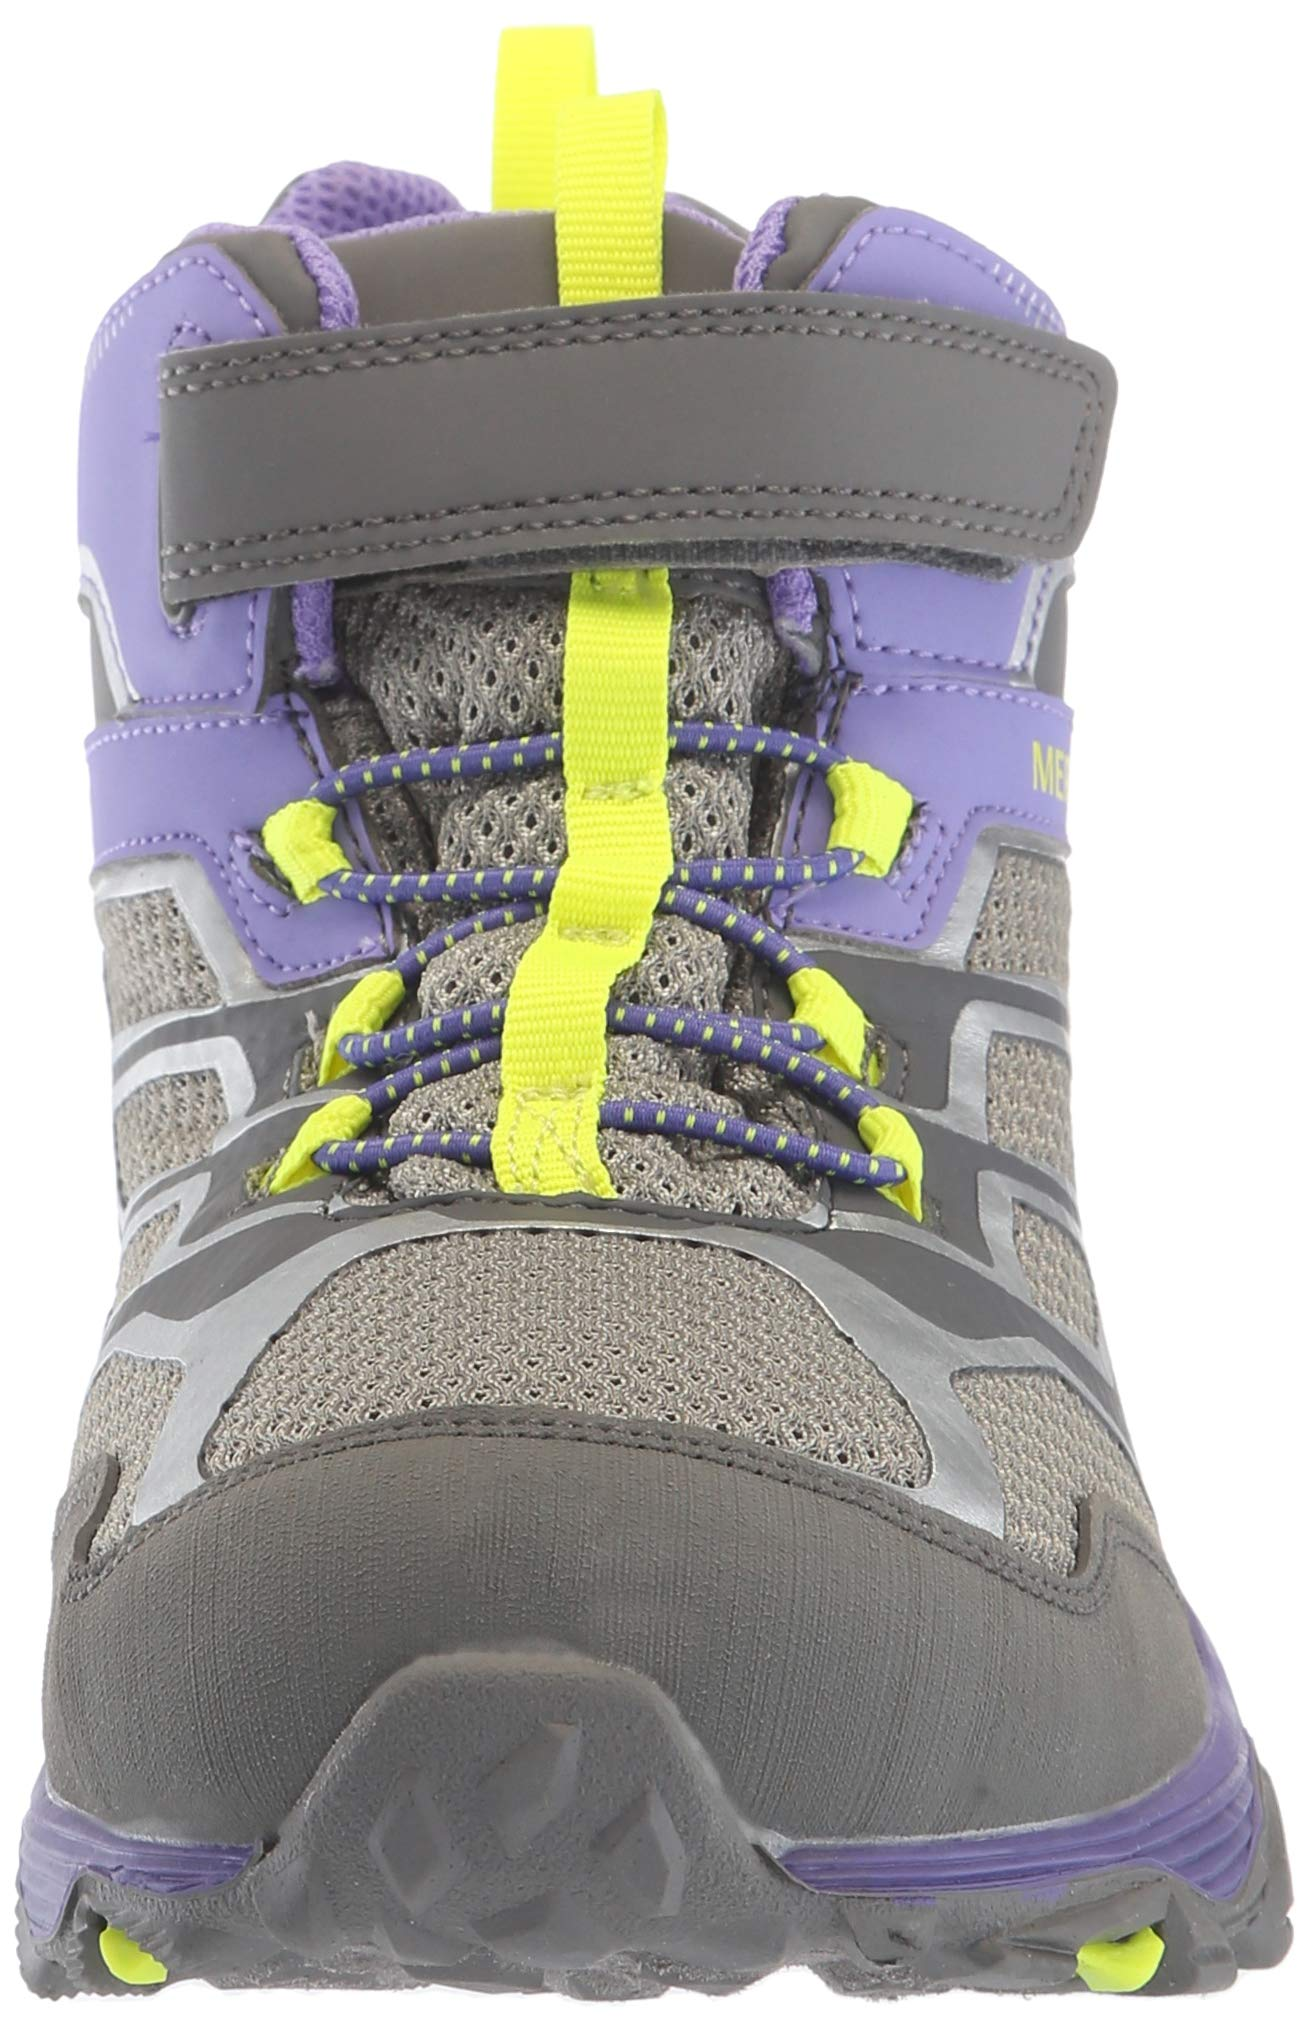 Merrell Girls' Moab FST Mid A/C WTRPF Hiking Shoe, Grey/Purple, 3.5 Medium US Big Kid by Merrell (Image #4)